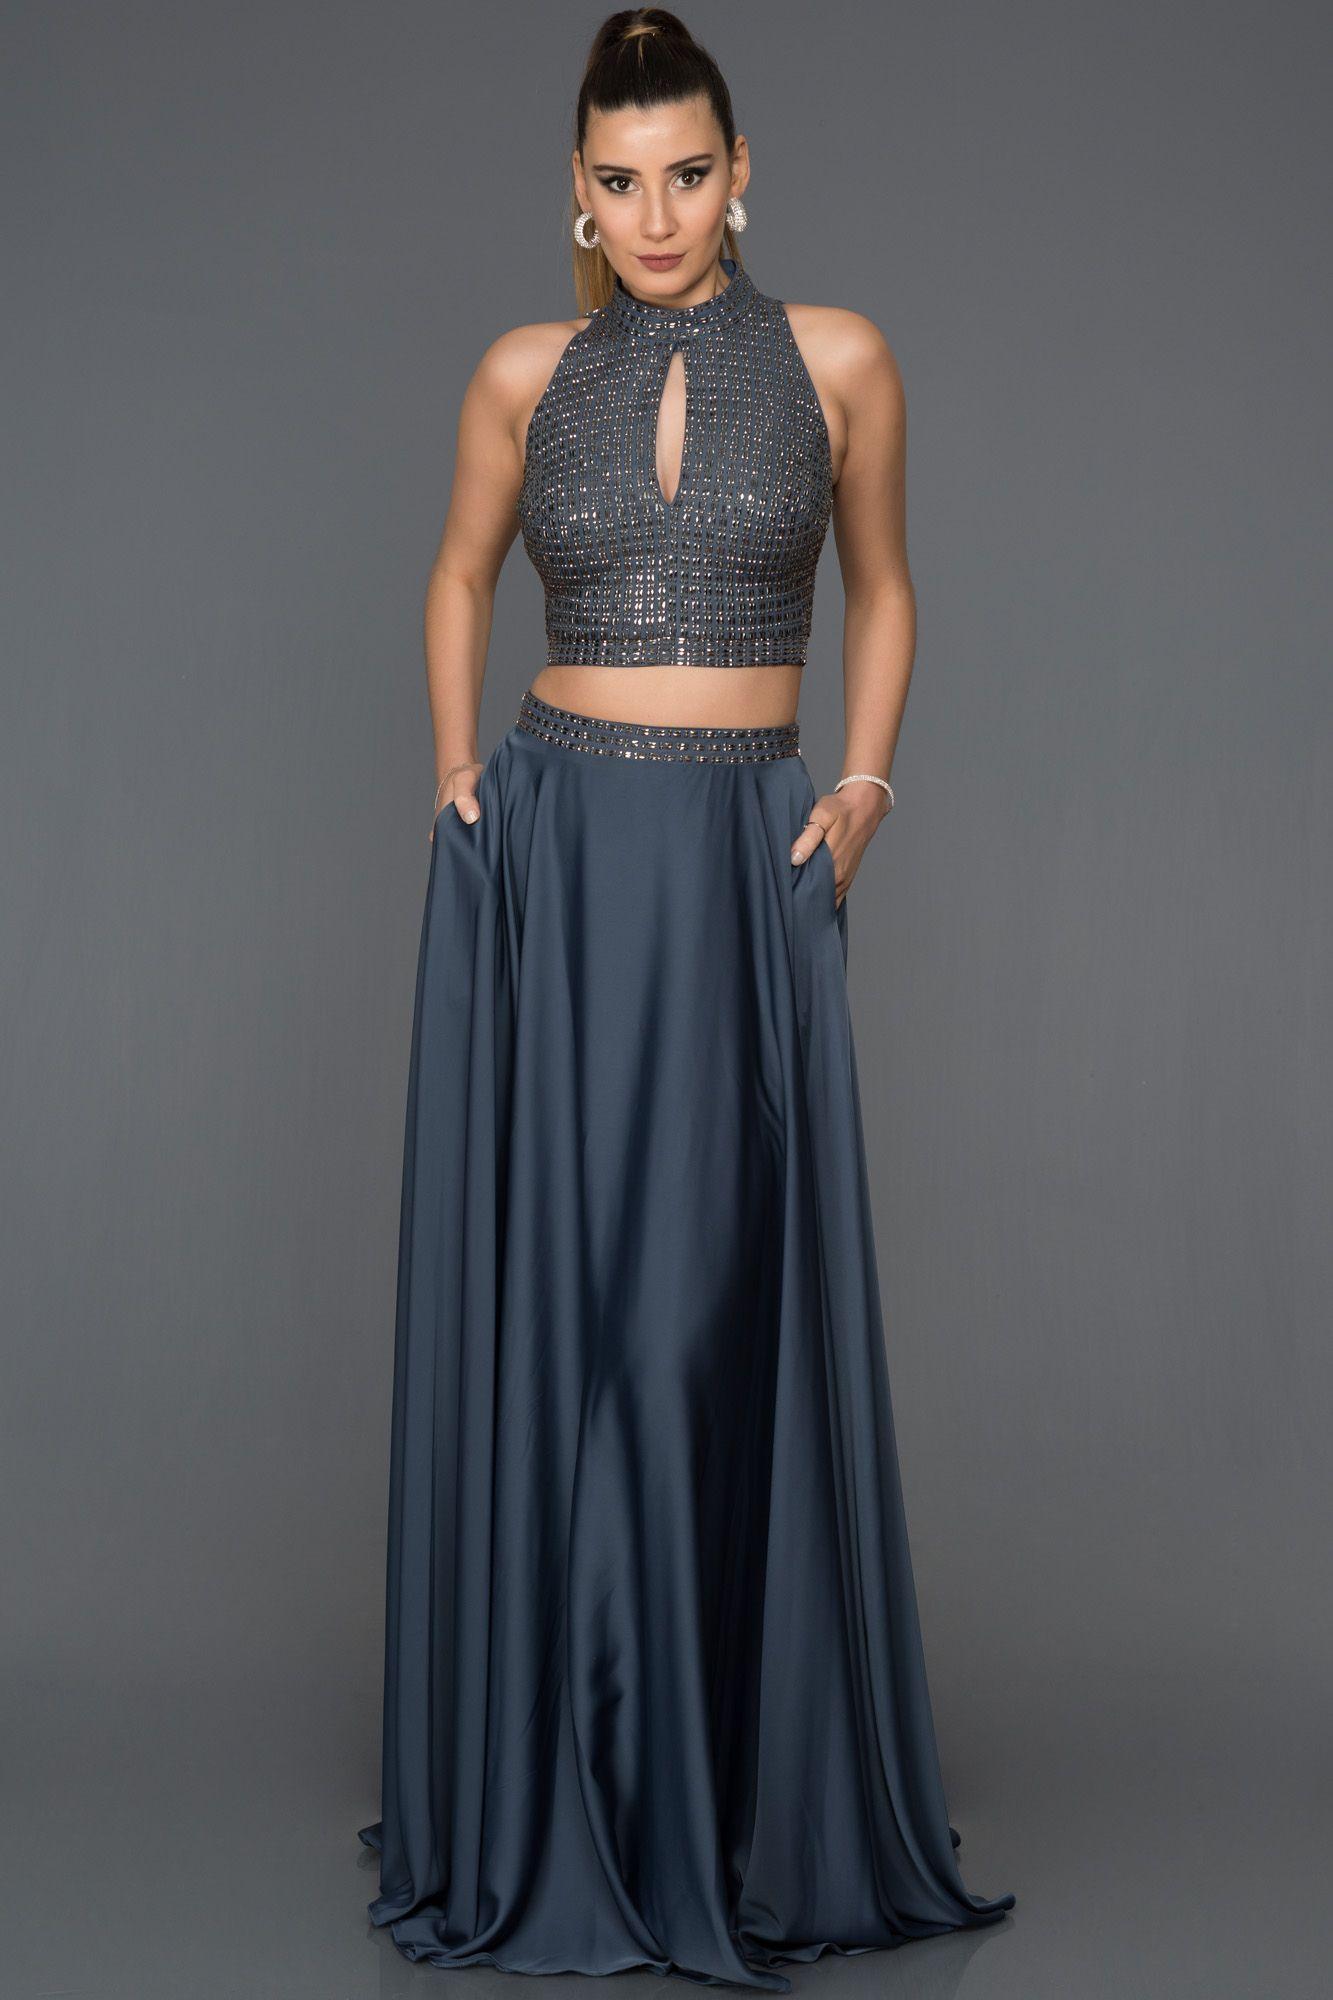 Lacivert Iki Parca Tasli Abiye Ab4425 Resmi Elbise Elbise Elbise Modelleri